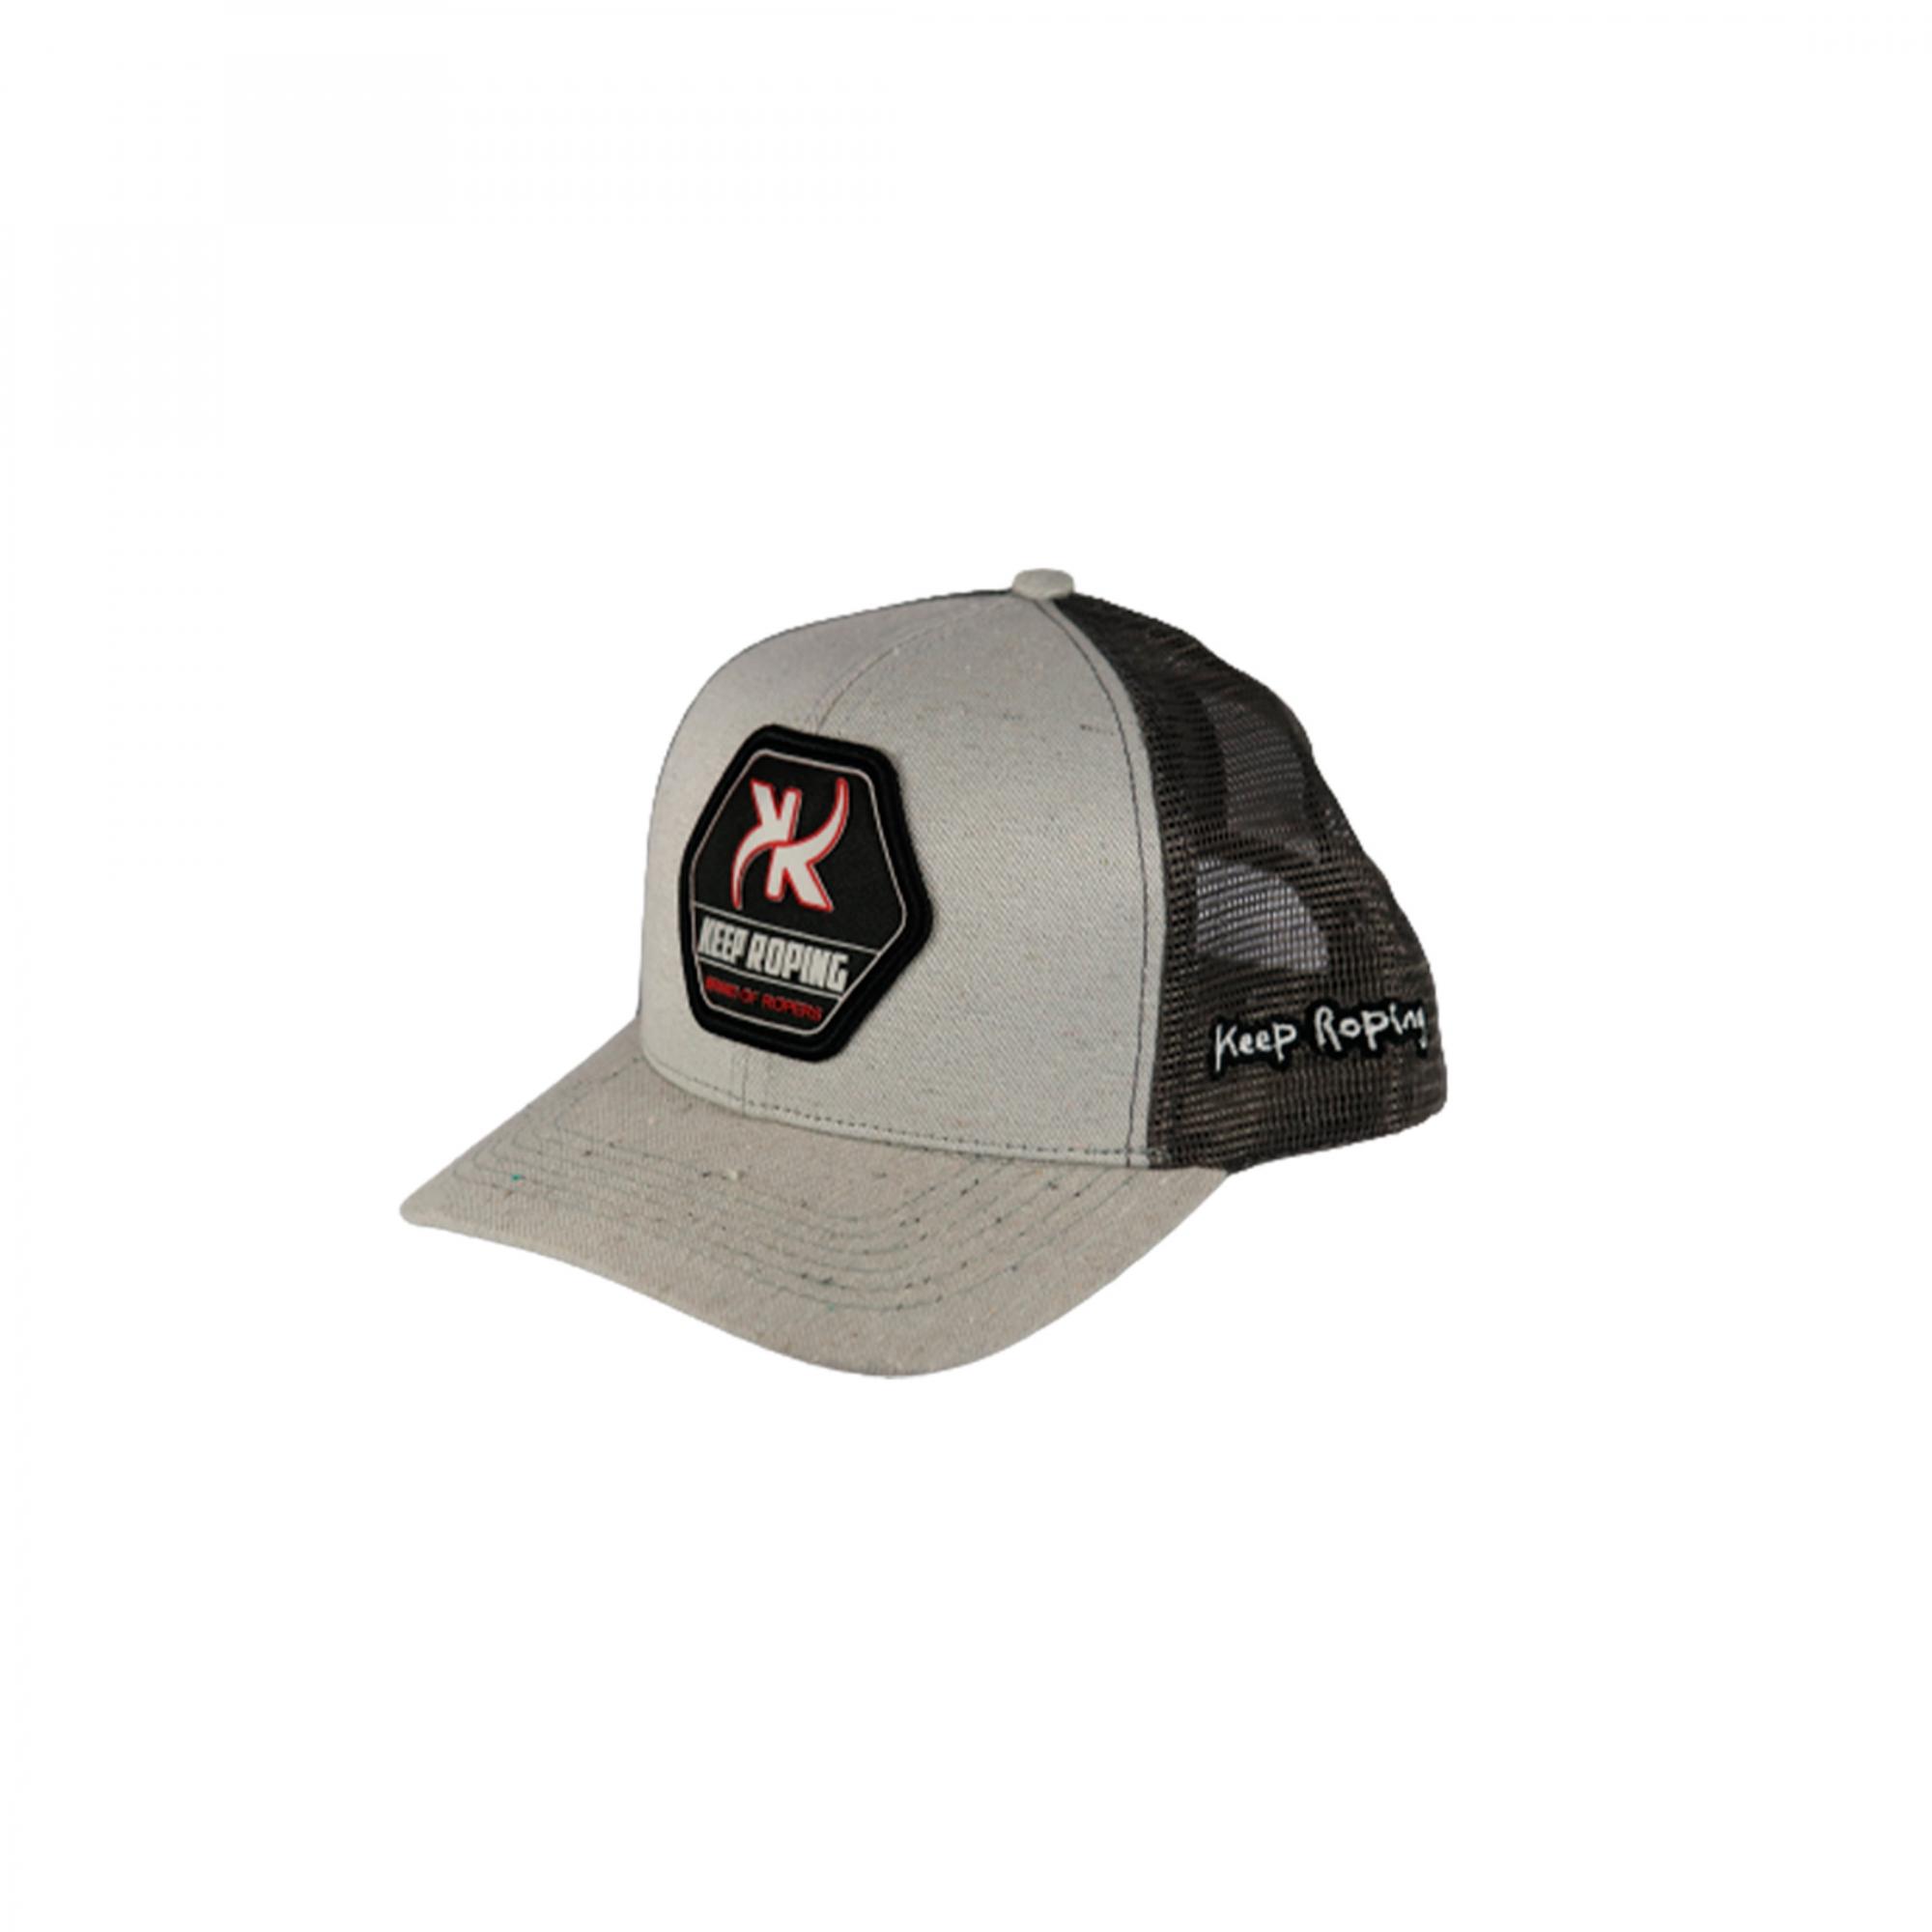 Boné Keep Roping Trucker Hat com aba curva Cinza/Chumbo